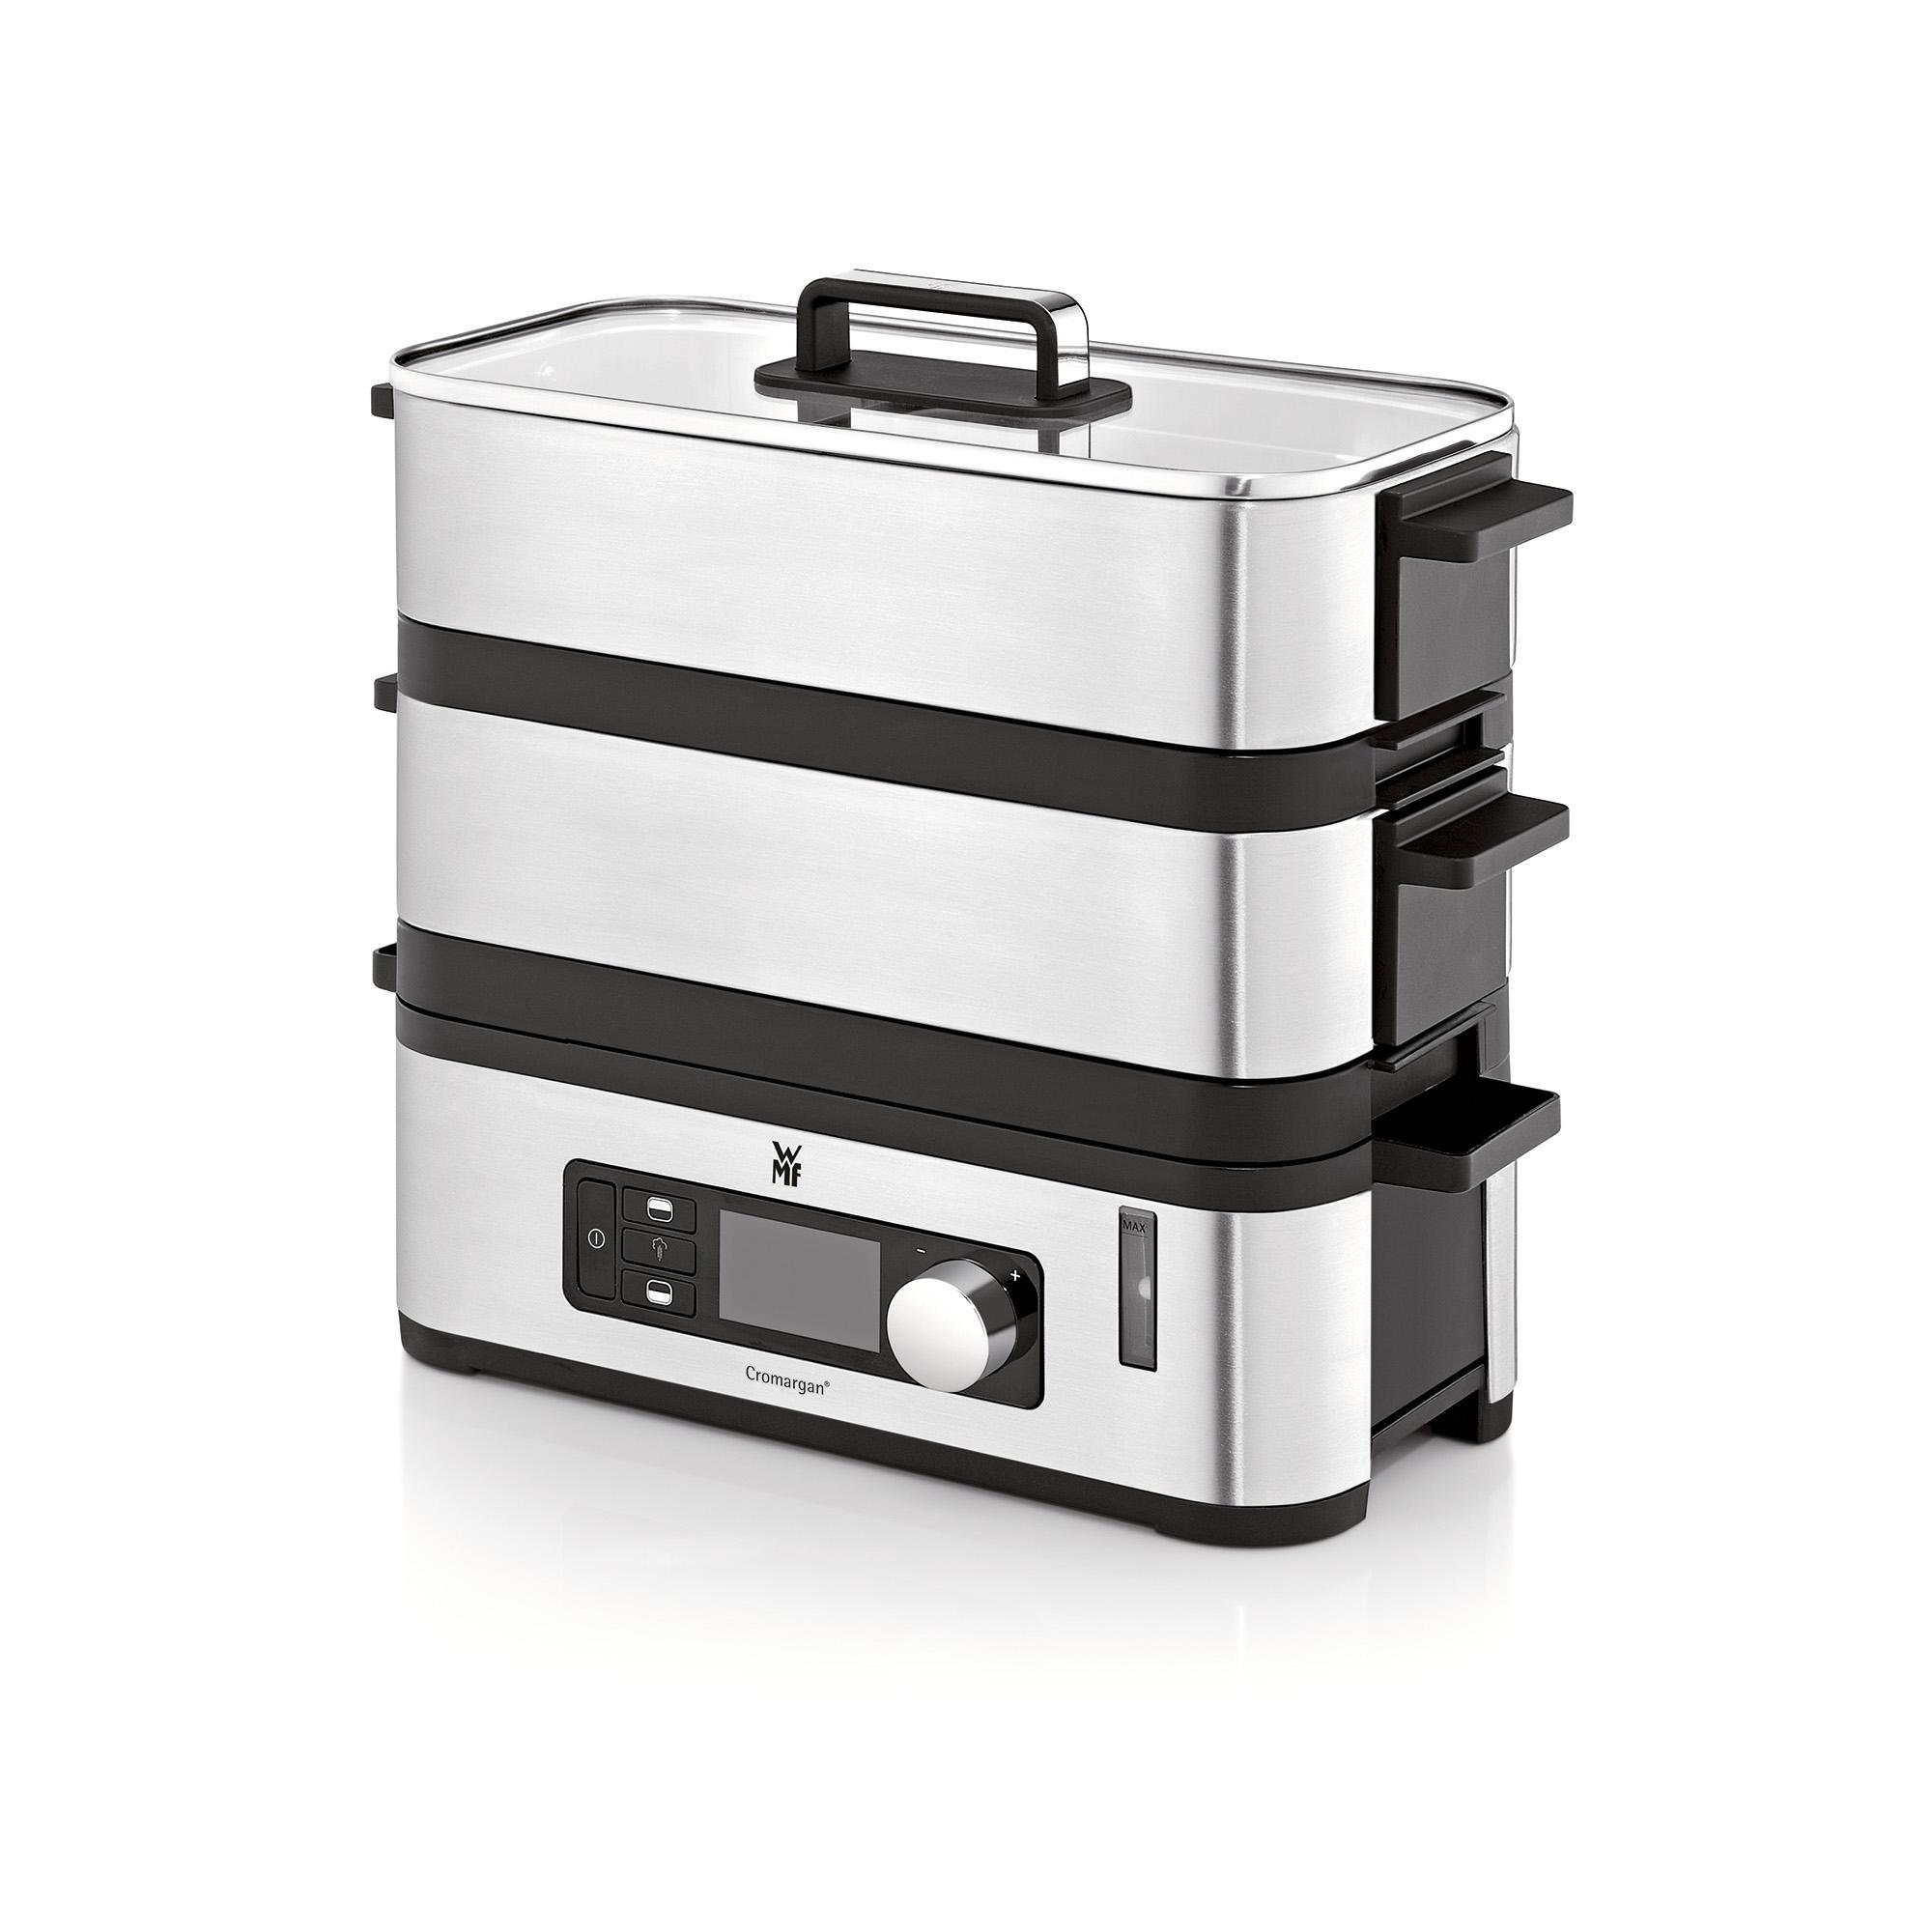 Amazon.de: WMF Küchenminis Dampfgarer